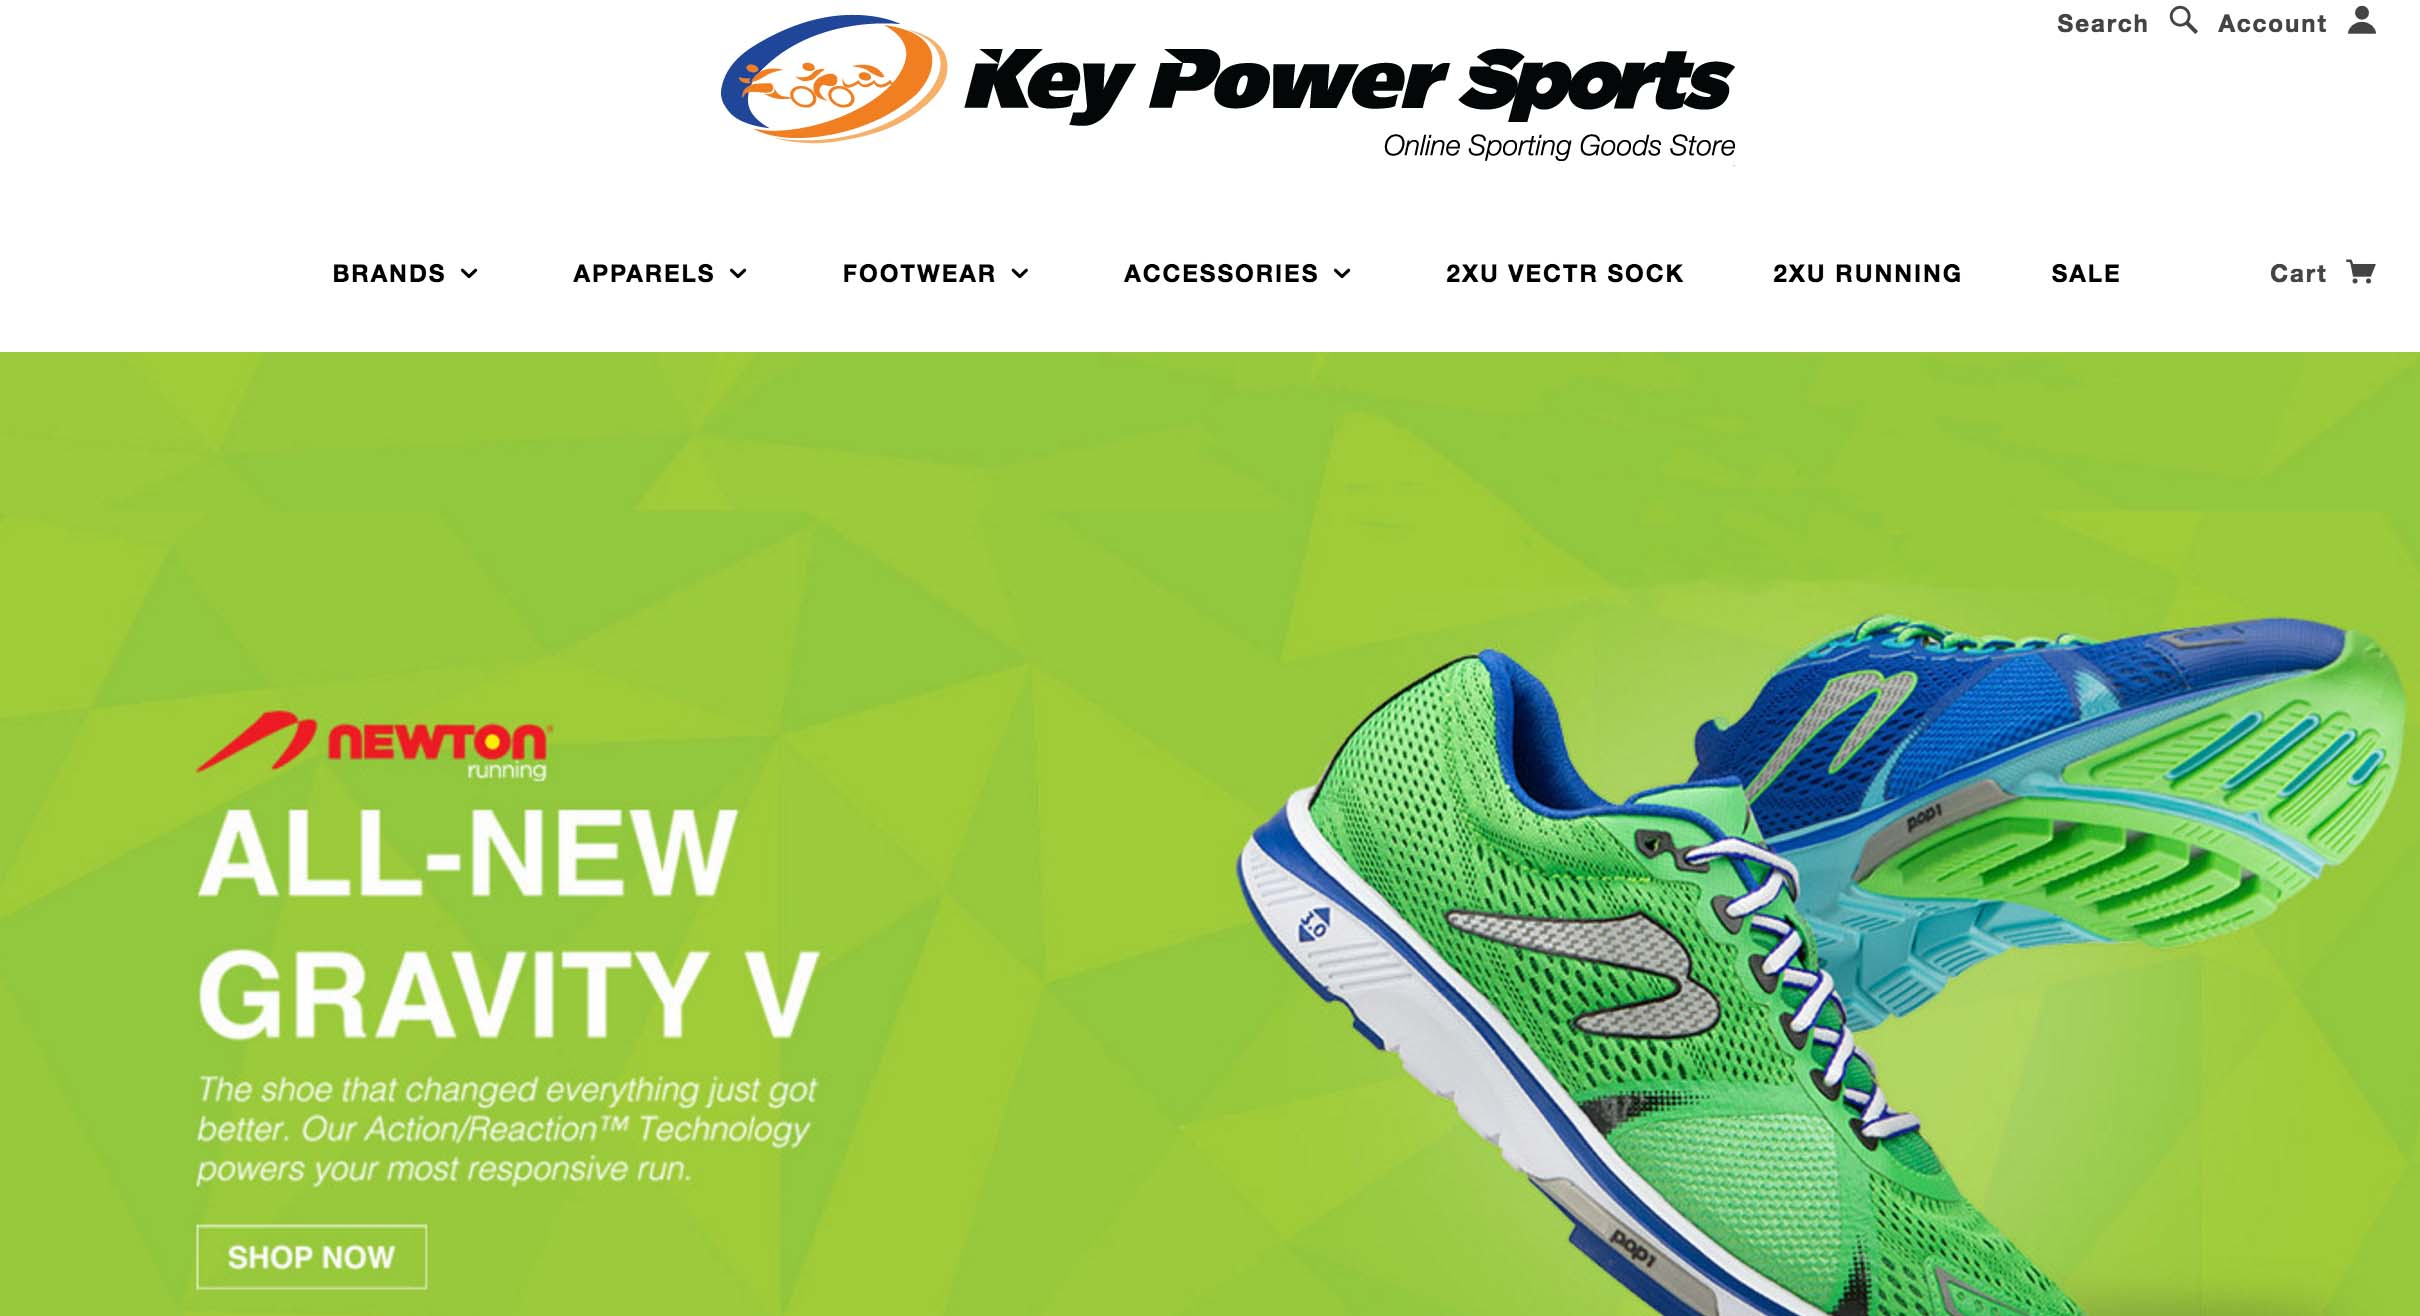 Photo Credit: Key Power Sports